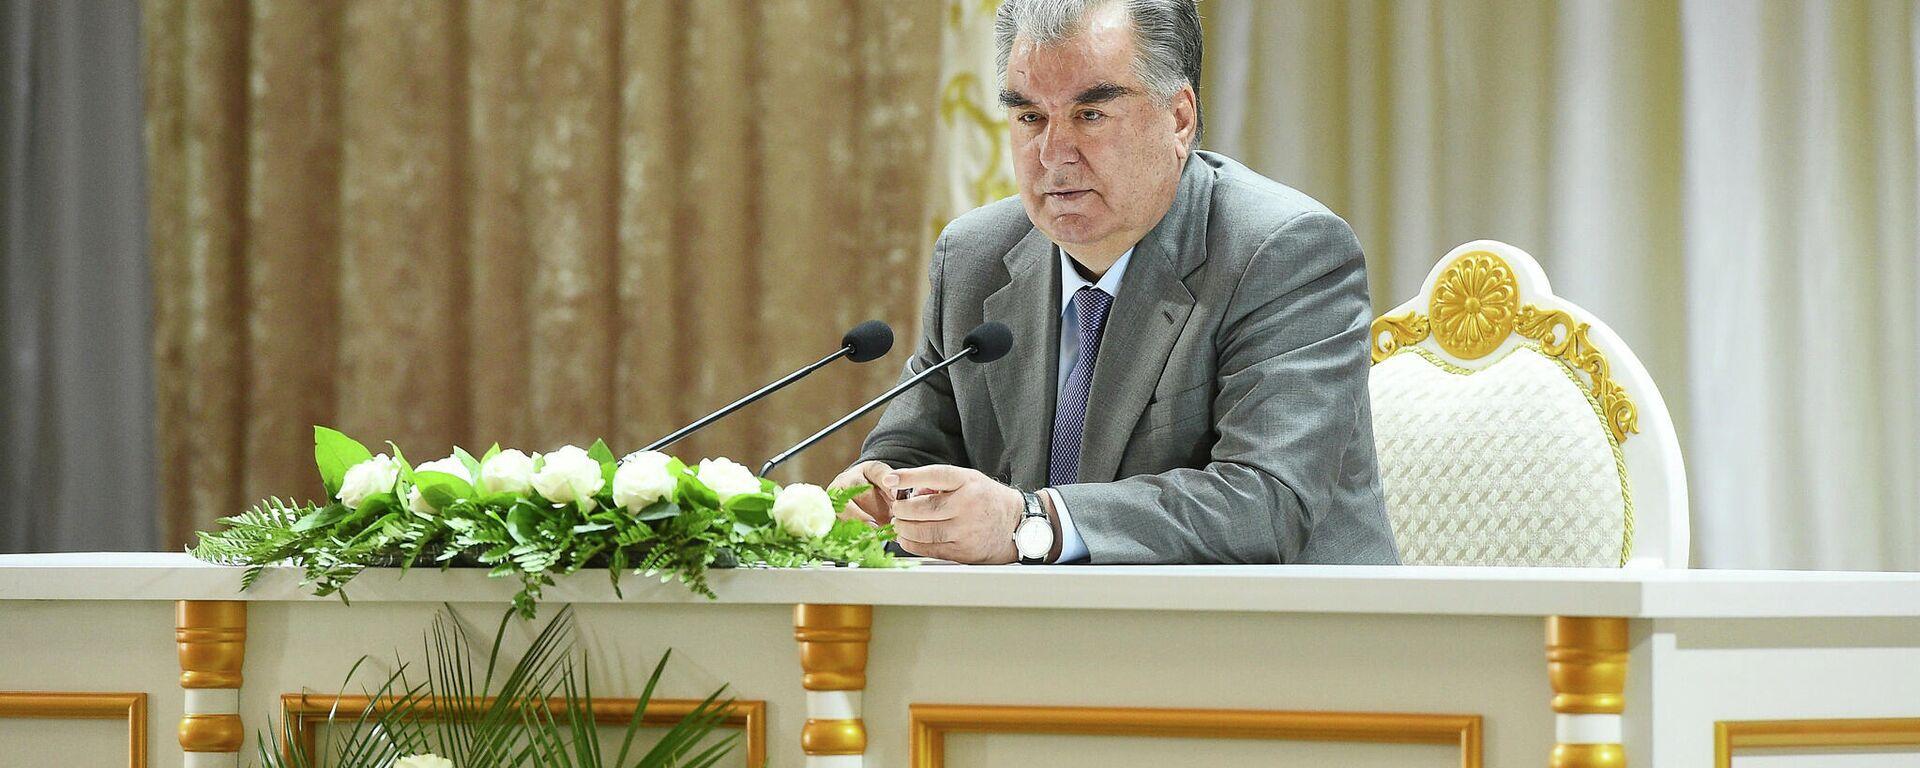 Президент Республики Таджикистан Эмомали Рахмон - Sputnik Тоҷикистон, 1920, 22.09.2021